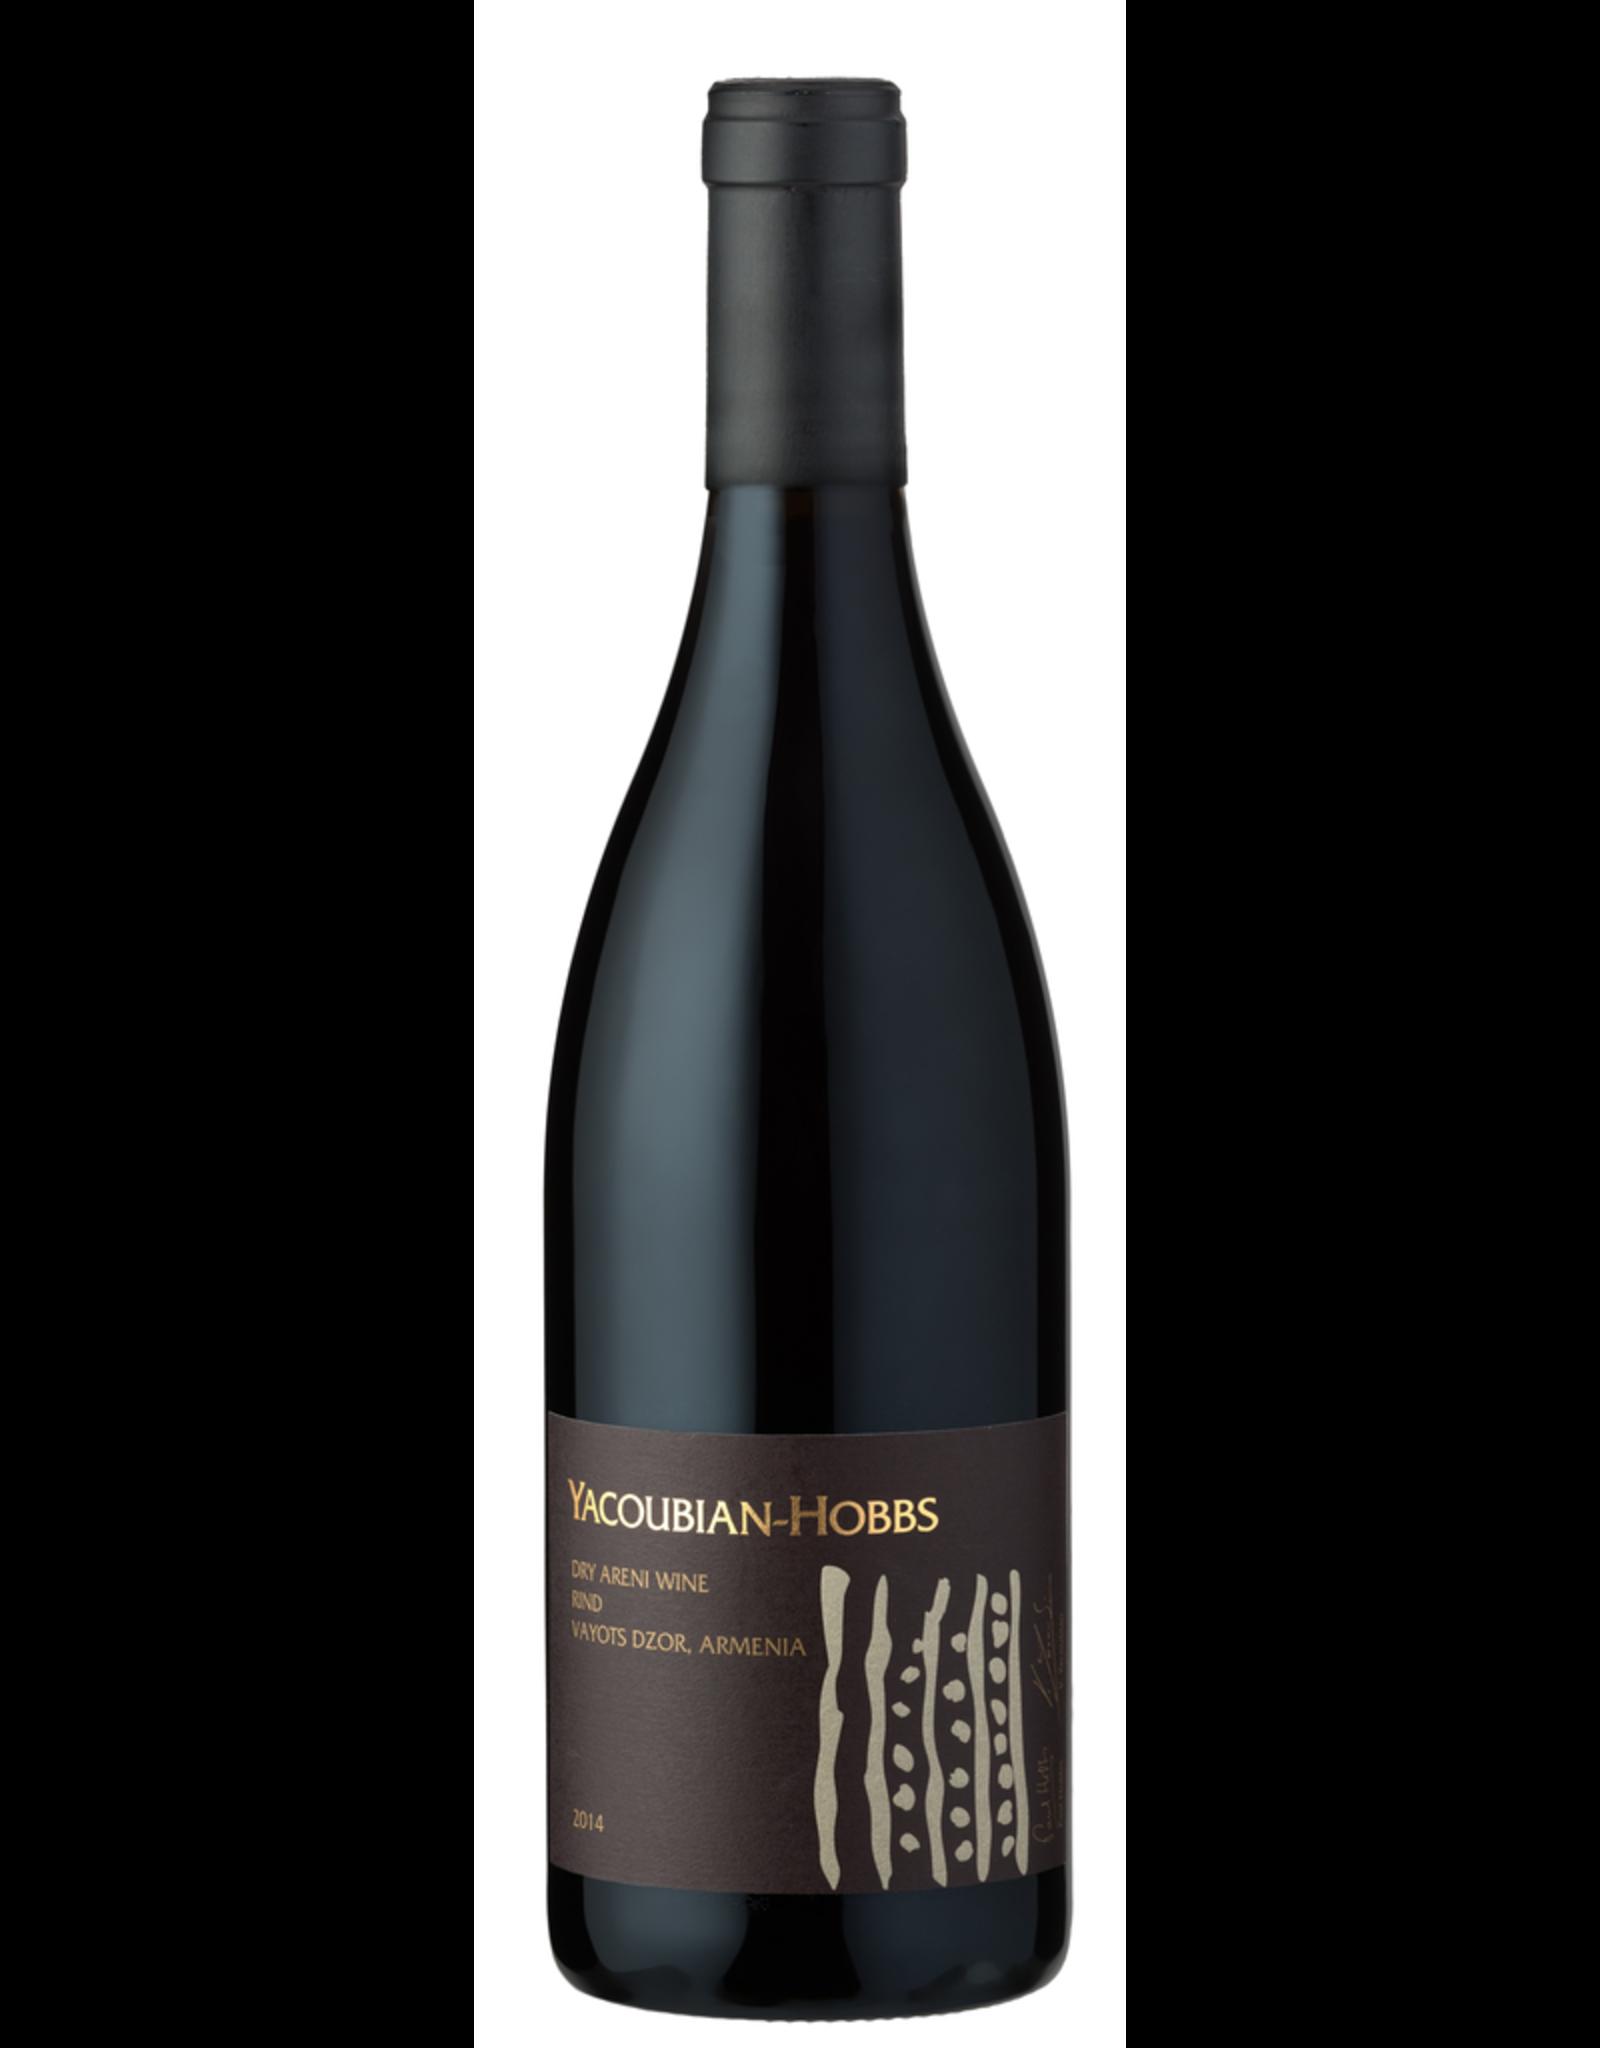 Red Wine 2015, Yacoubian & Paul Hobbs ARENI, Areni Noir, Rind, Vayots Dzor, Armenia, 14% Alc, CTnr, TW92